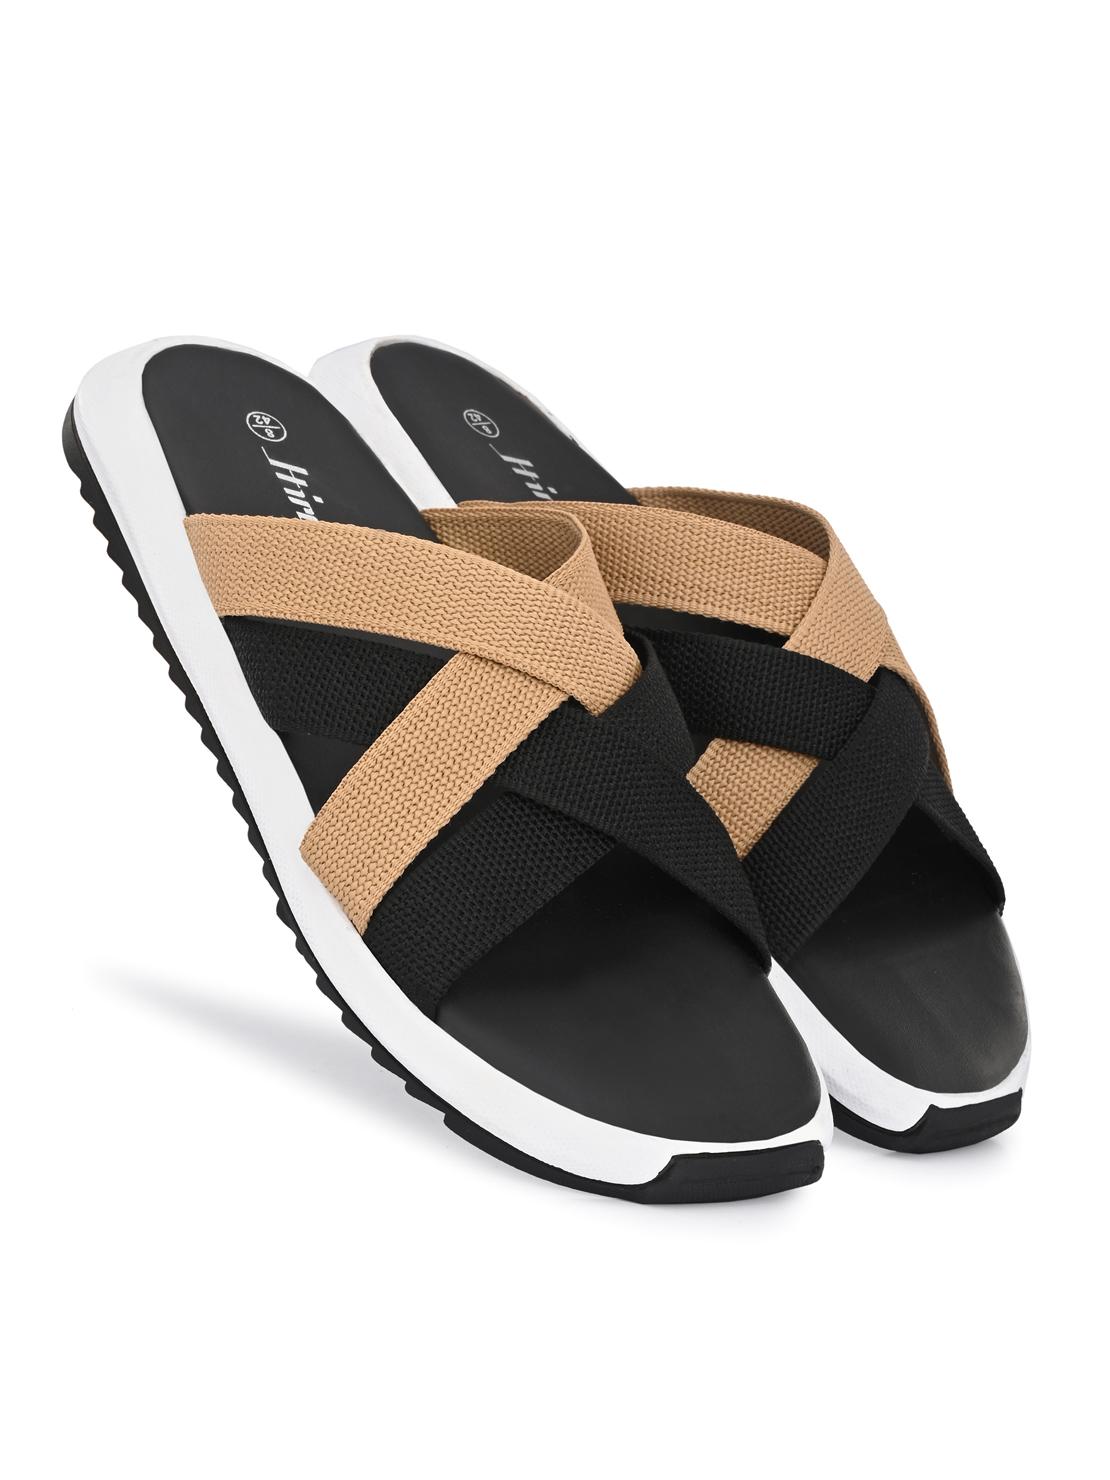 Hirolas | Hirolas® Men's Black Multi Strap Flip-Flop Slider Slippers (UK6/EU40)